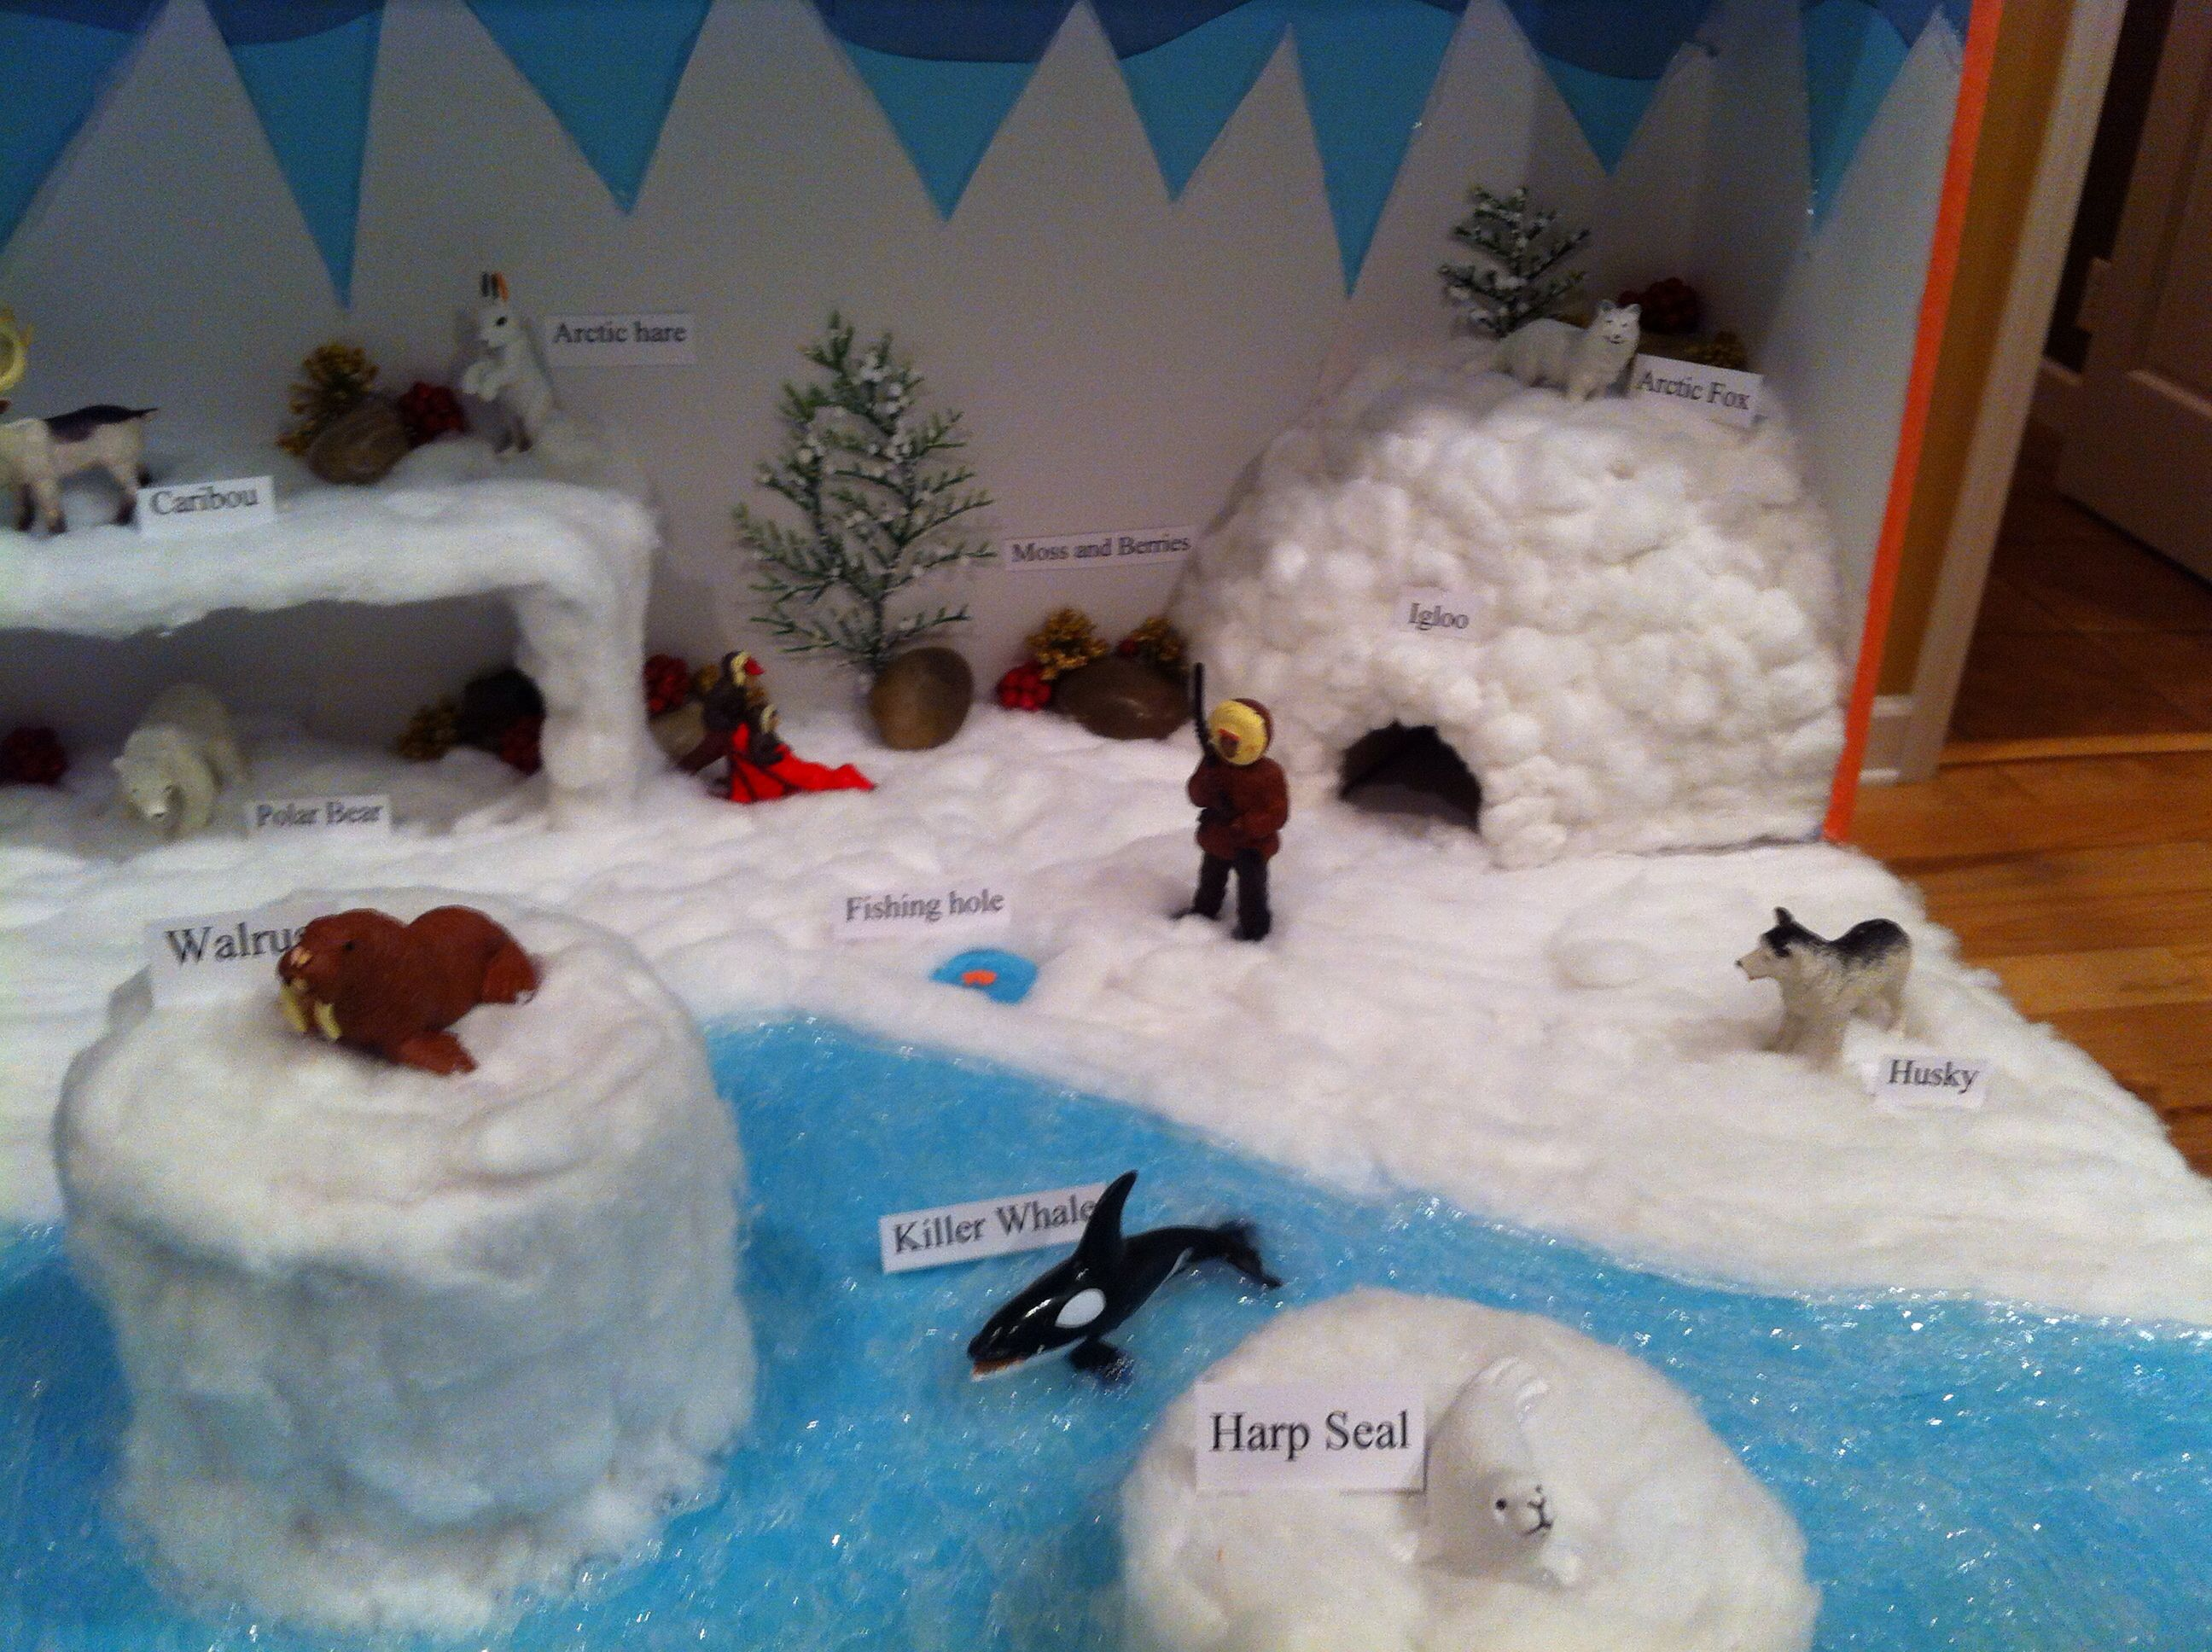 arctic tundra diorama science pinterest arctic tundra dioramas and biomes. Black Bedroom Furniture Sets. Home Design Ideas